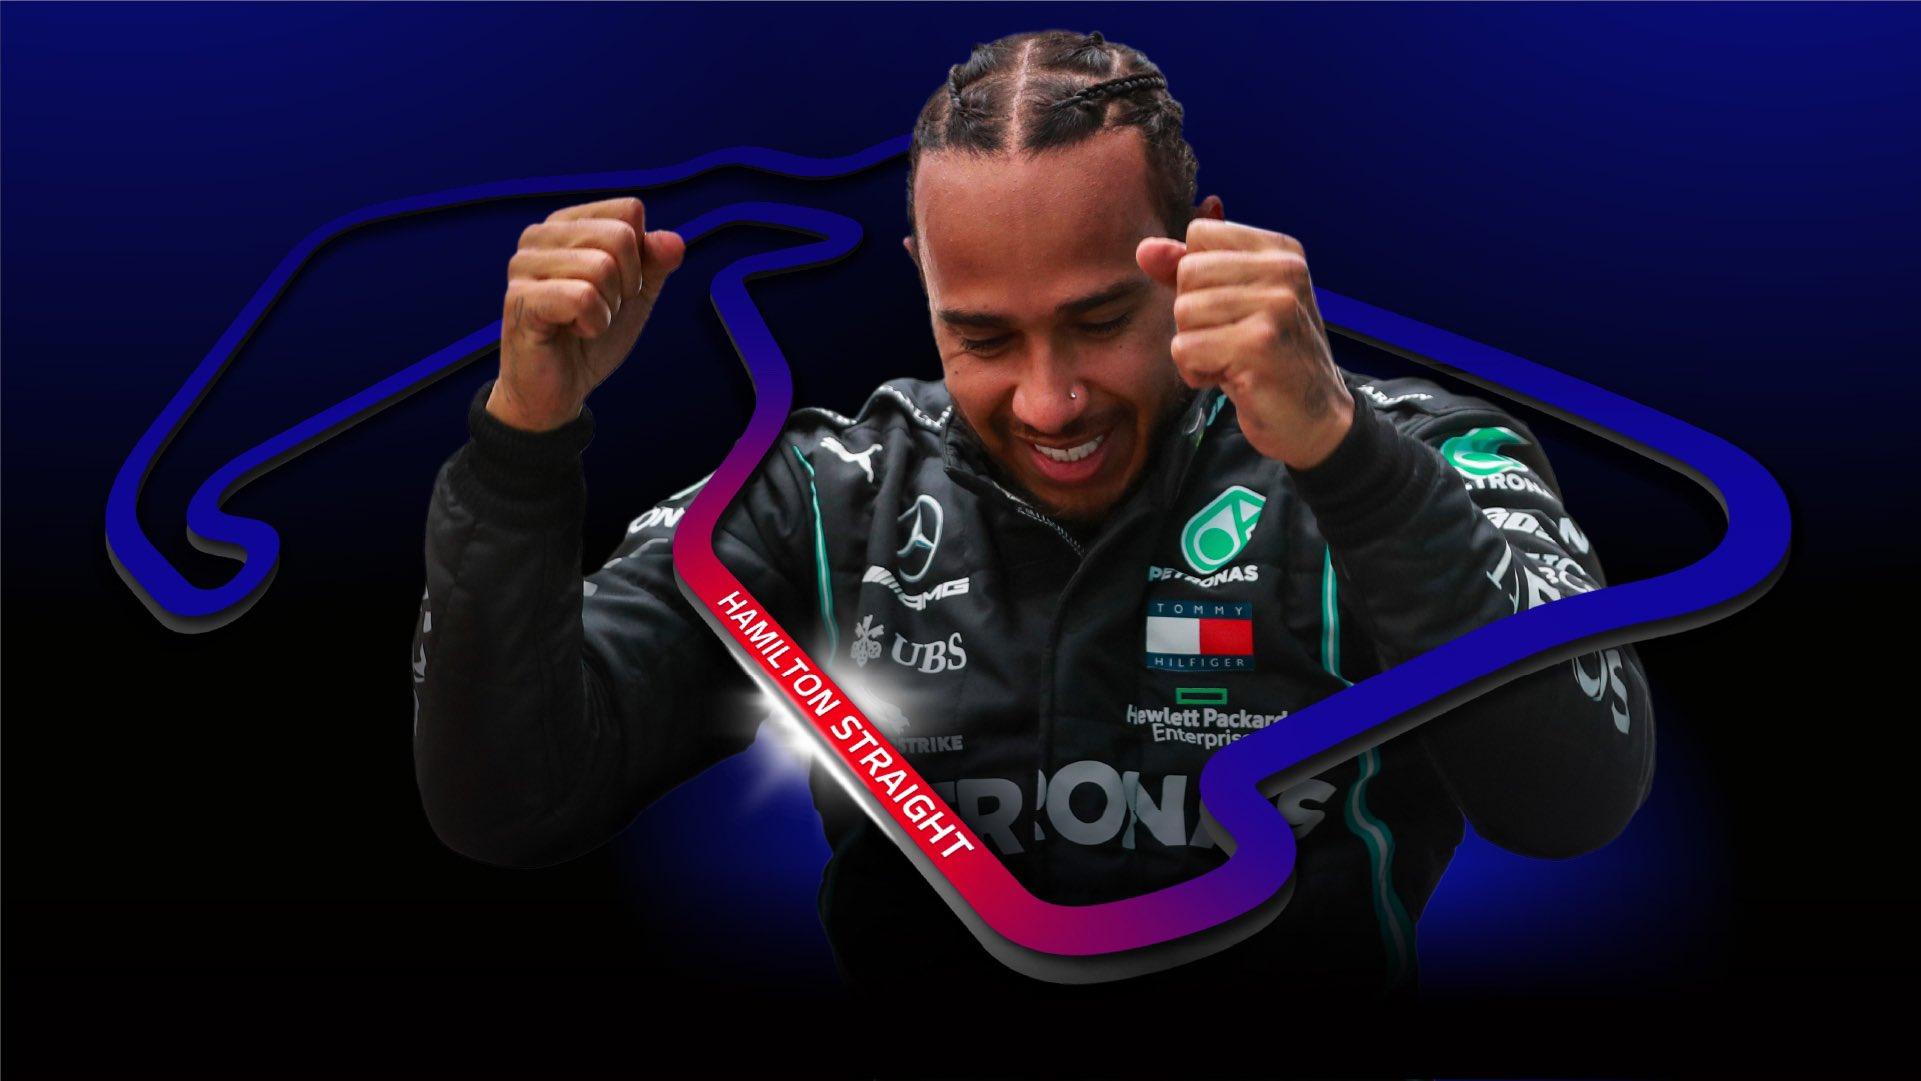 fot. SilverstoneUK/Twitter